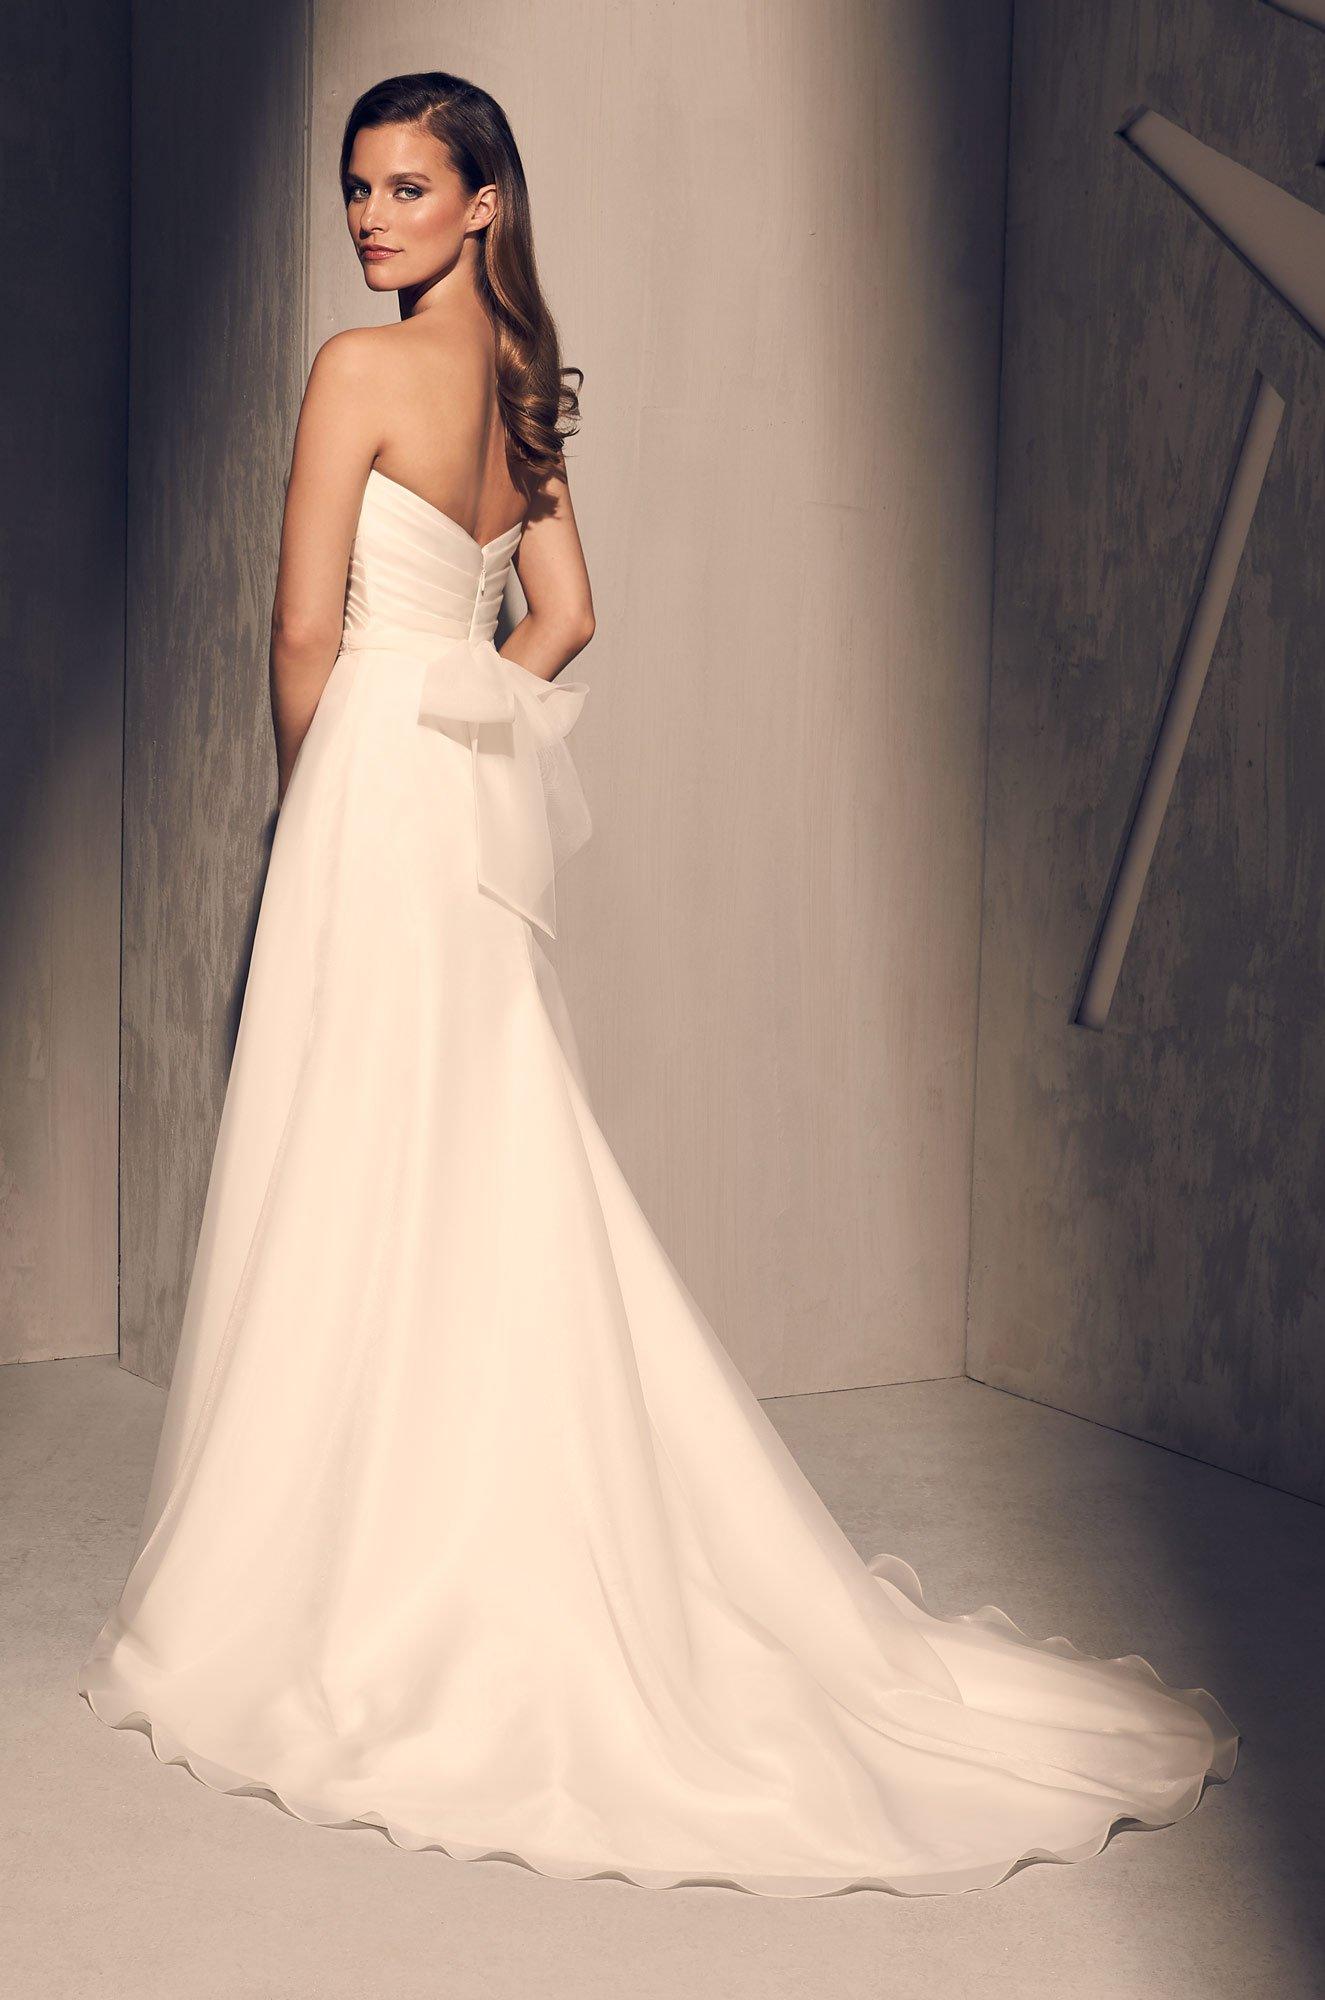 Pleated Bodice Wedding Dress - Style #2213 | Mikaella Bridal